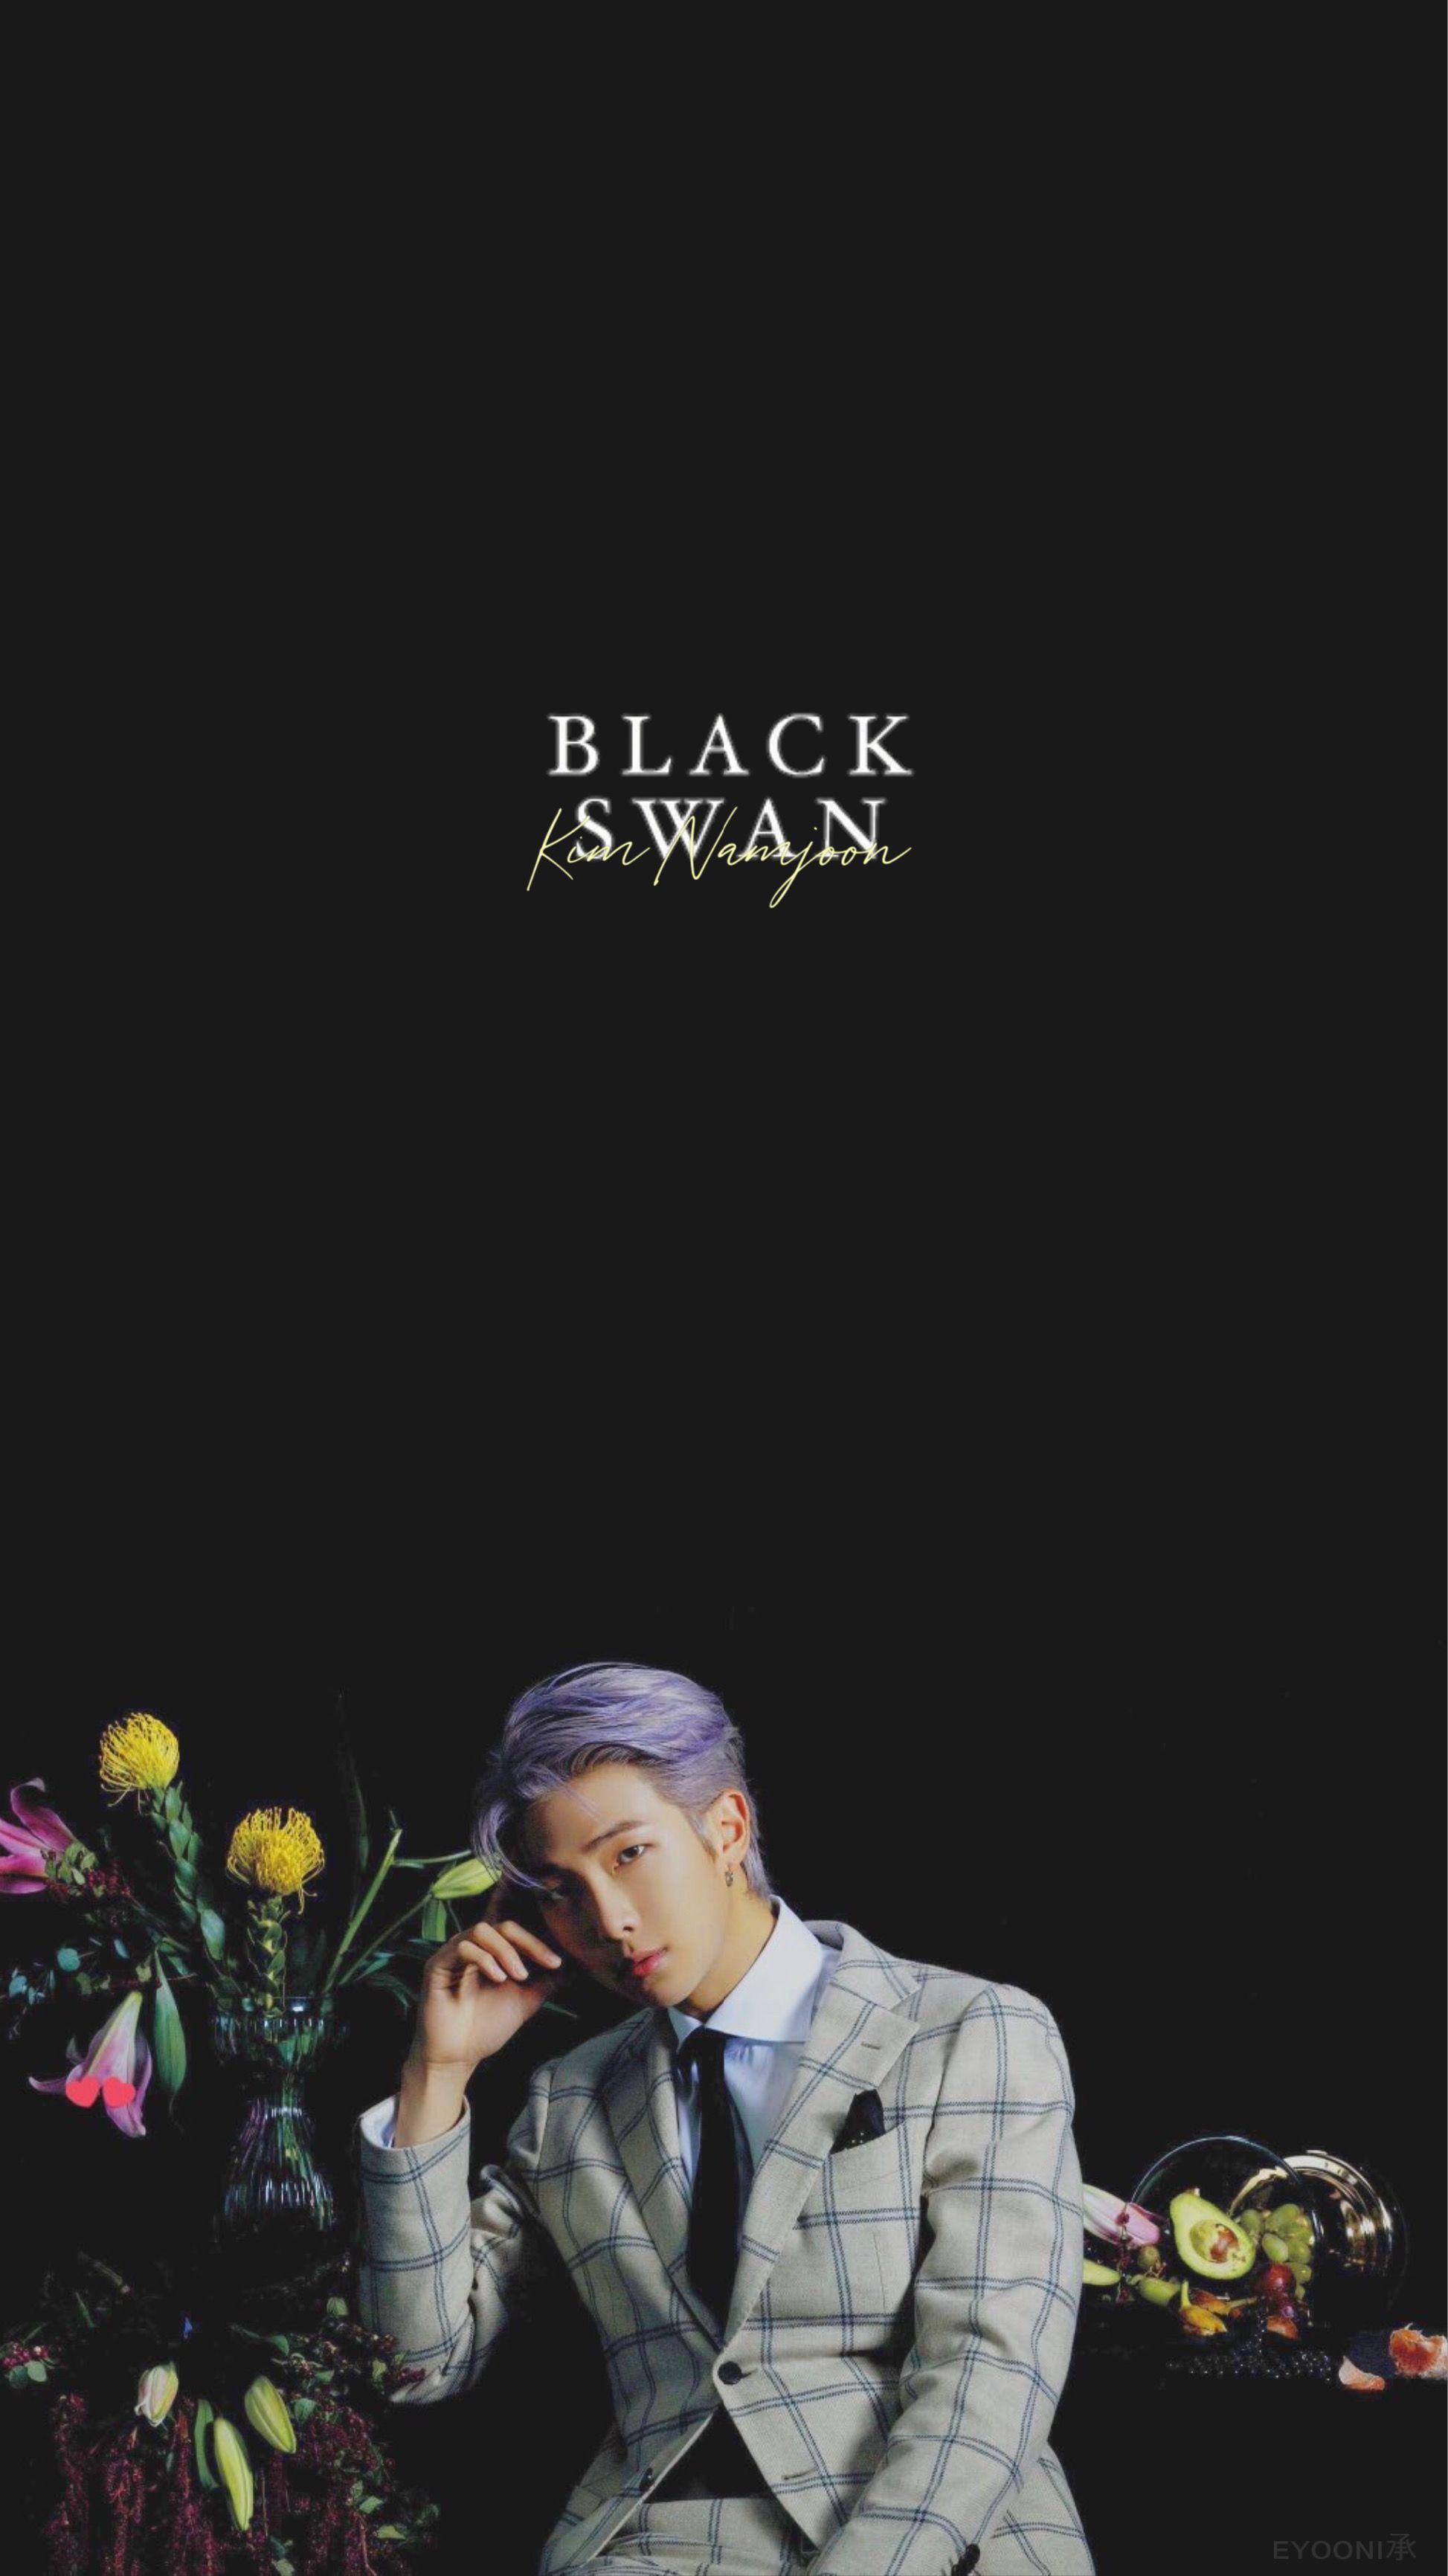 Black Swan Official Mv Photo Sketch Lockscreen Wallpapers Bts Wallpaper Bts Walpaper Bts Concept Photo